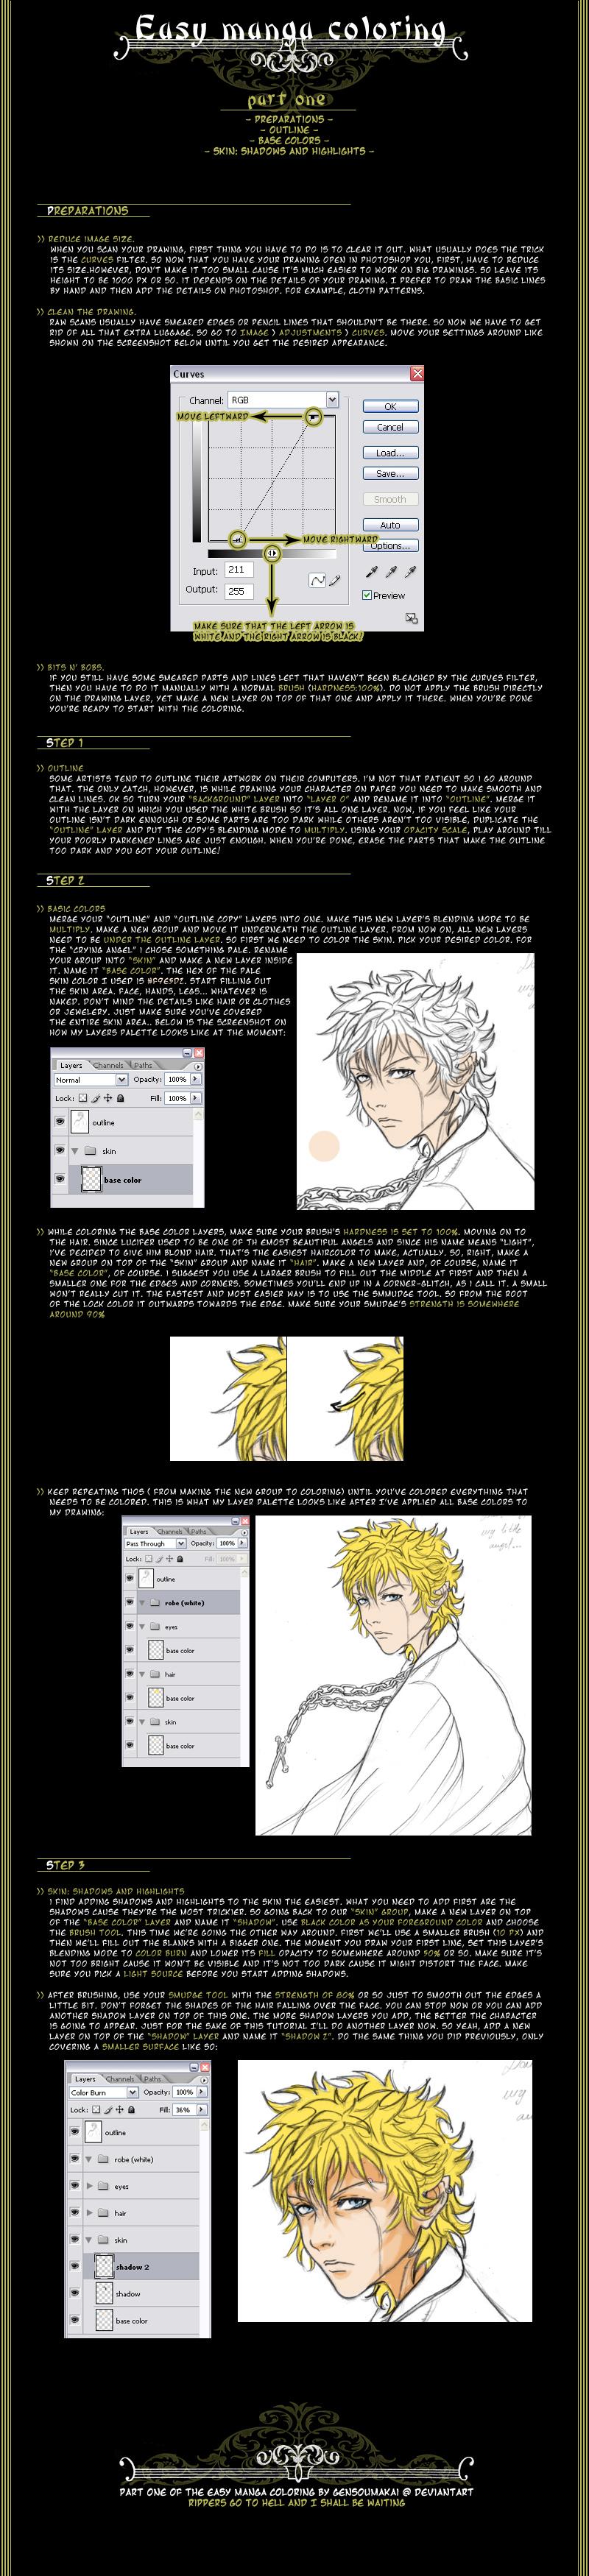 Easy manga coloring pt1 by GensouMakai